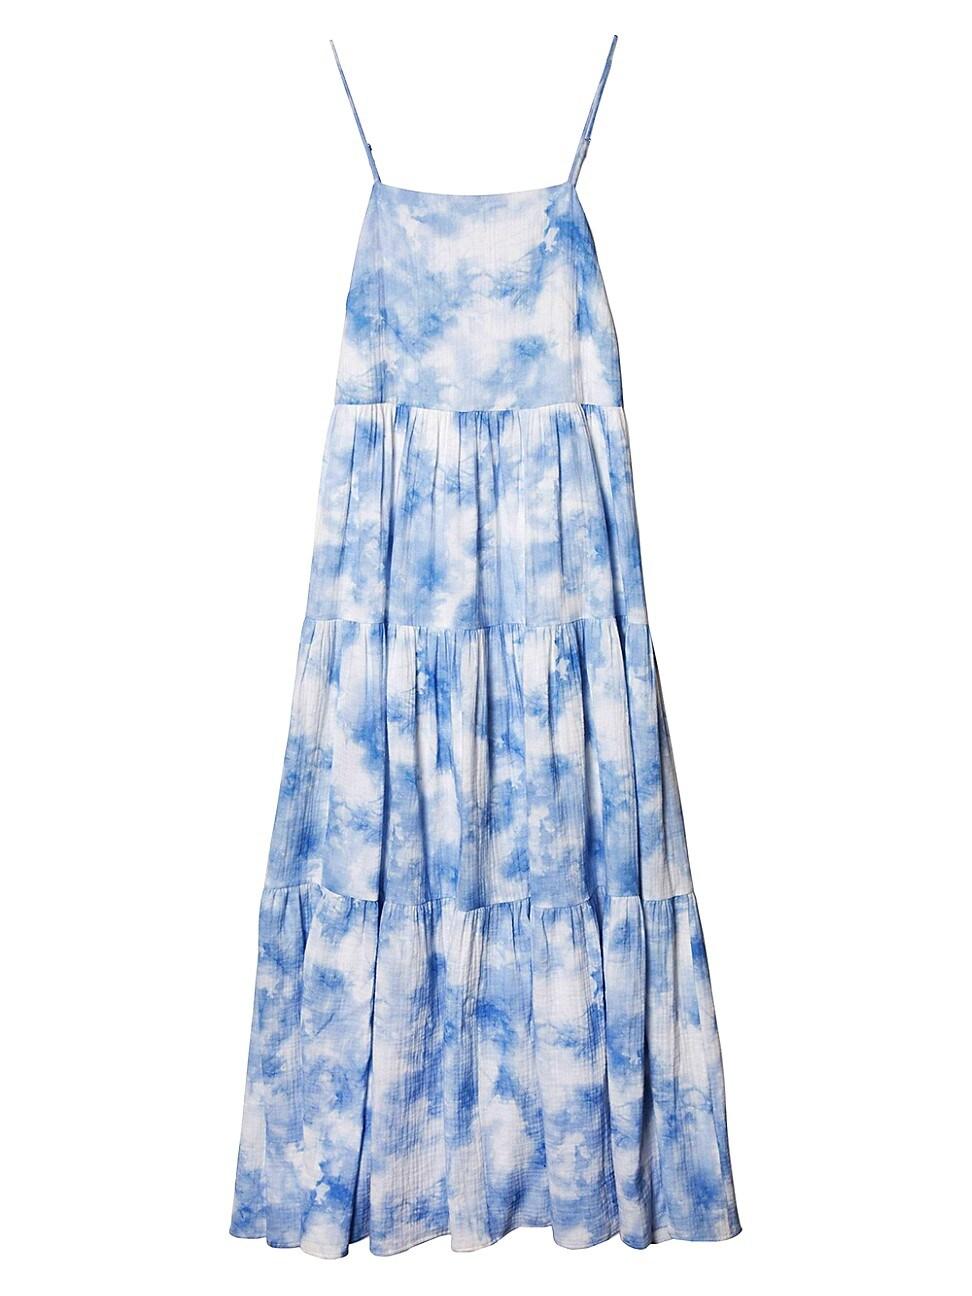 Jonathan Simkhai WOMEN'S CLARISSA TIE-DYE TIERED DRESS